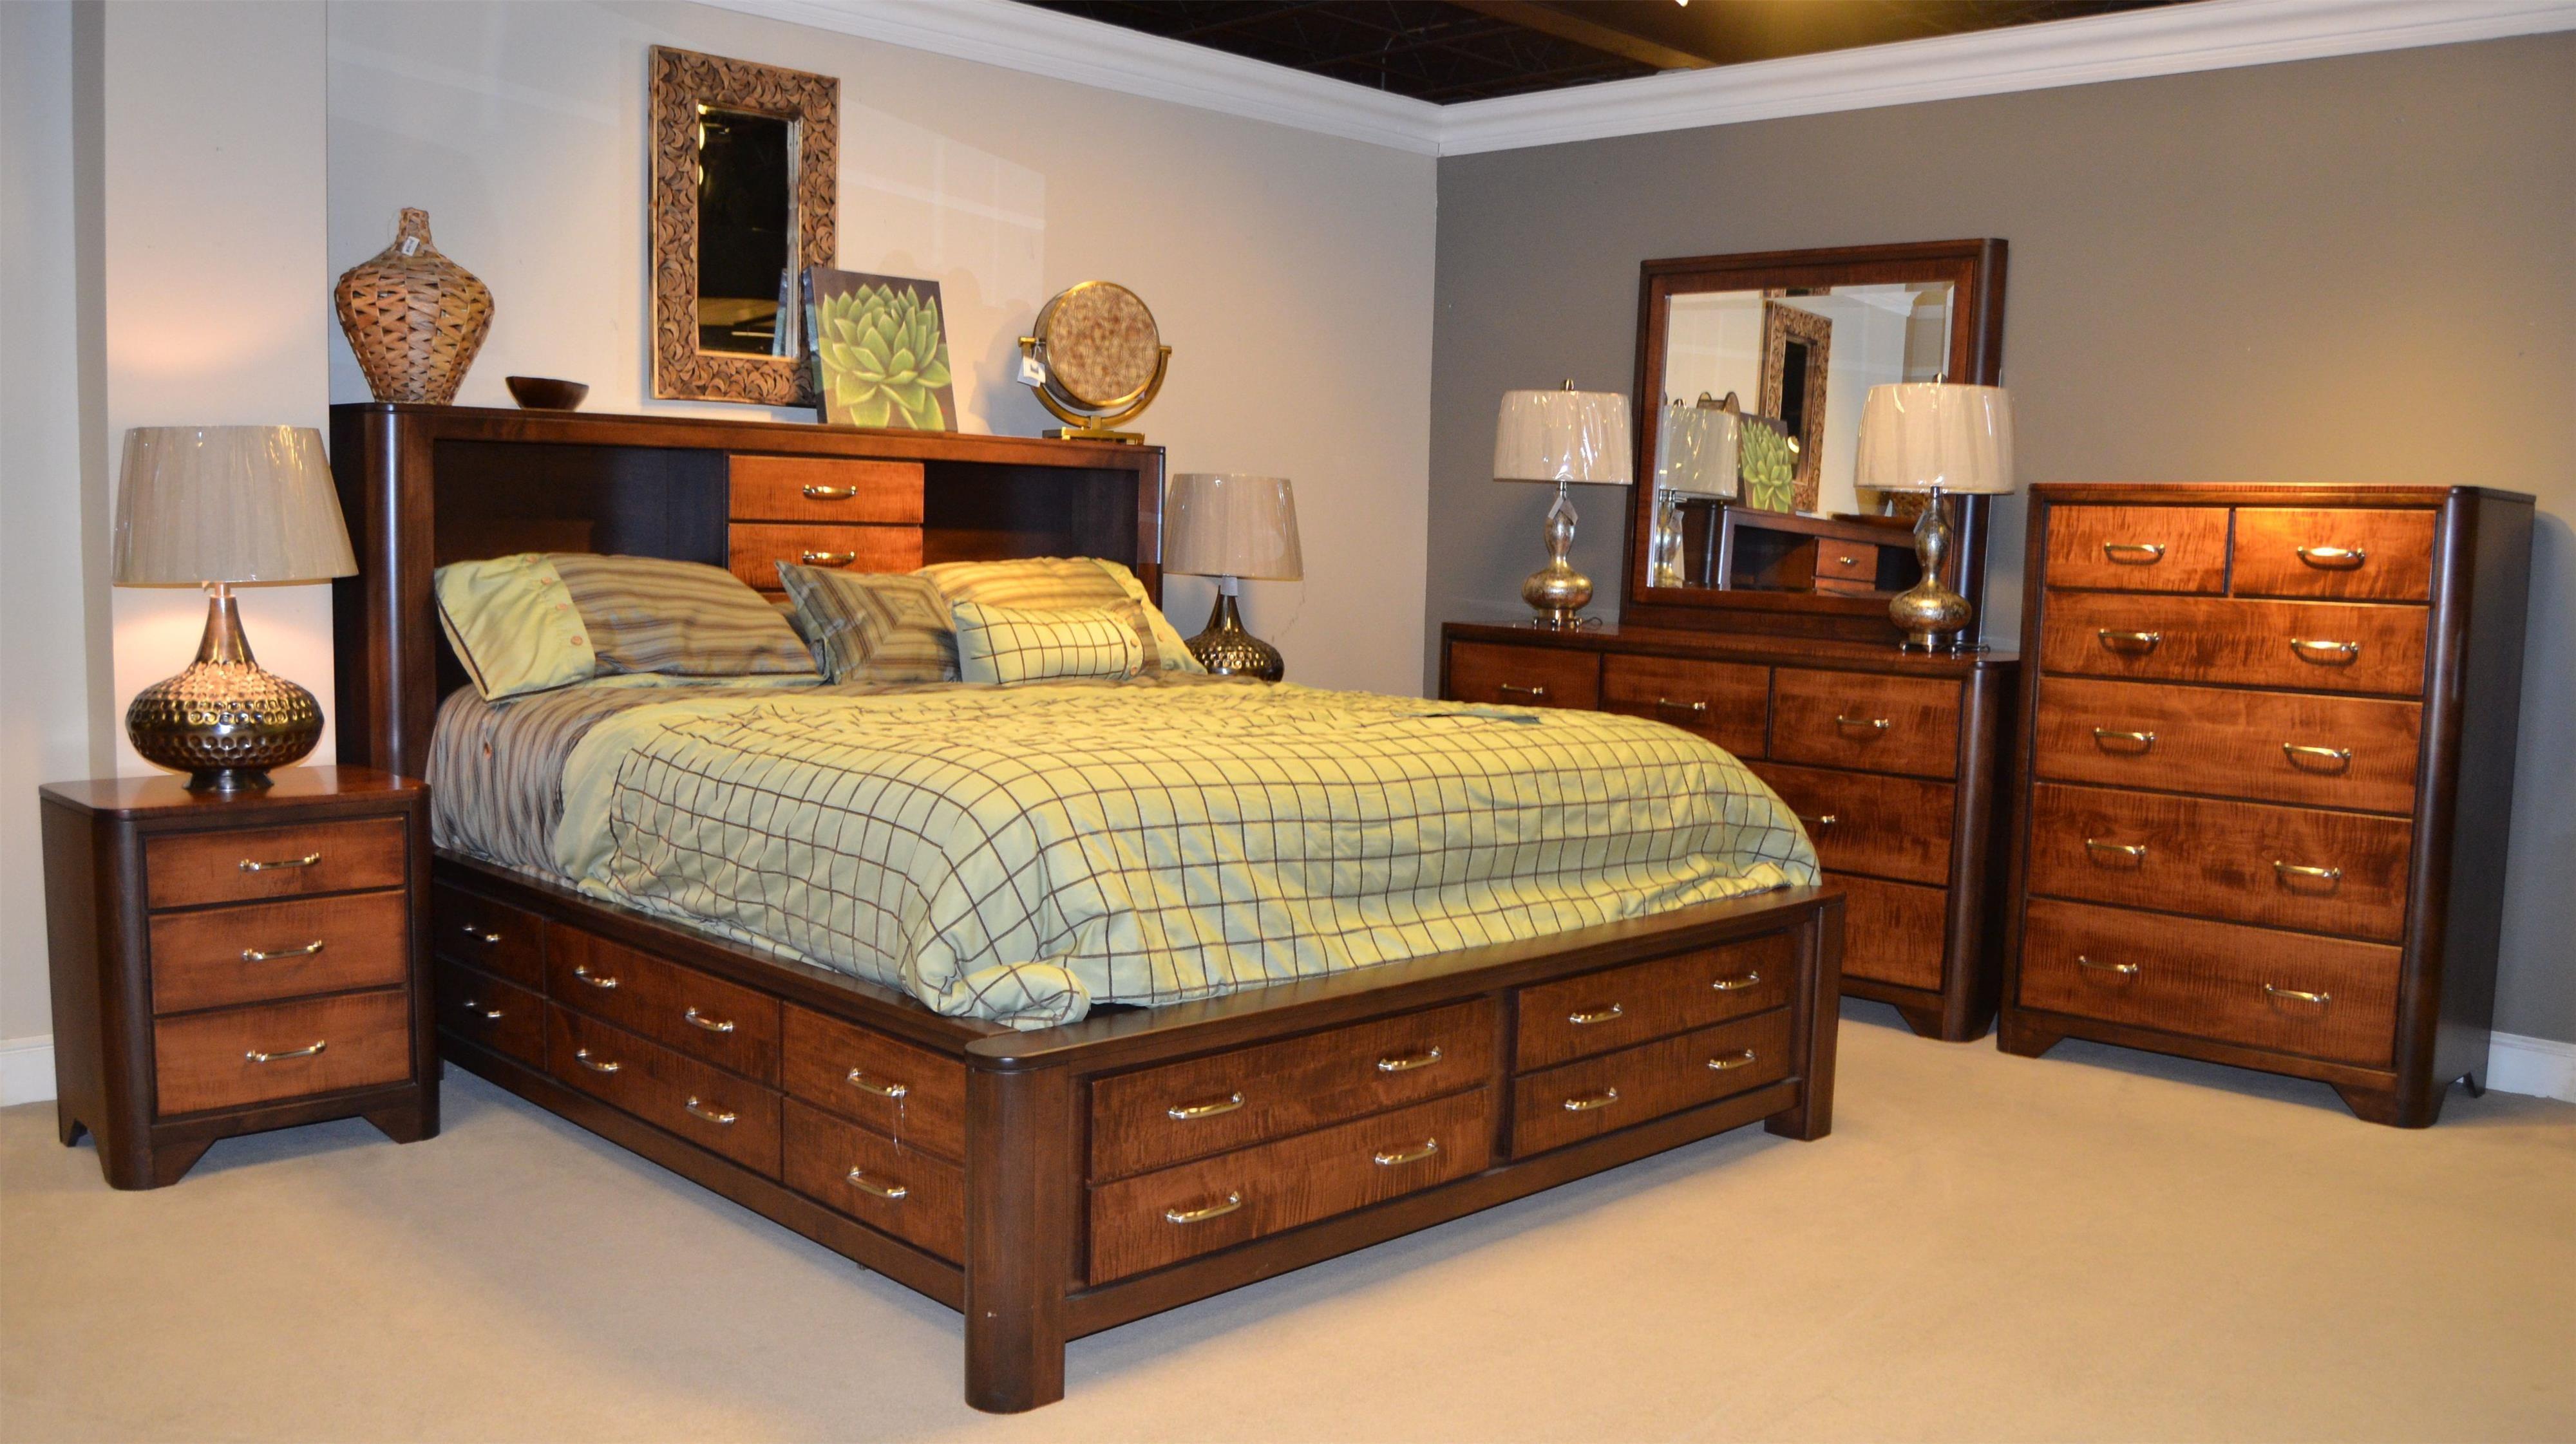 DVW2900 Bedroom Group by Wayside Custom Furniture